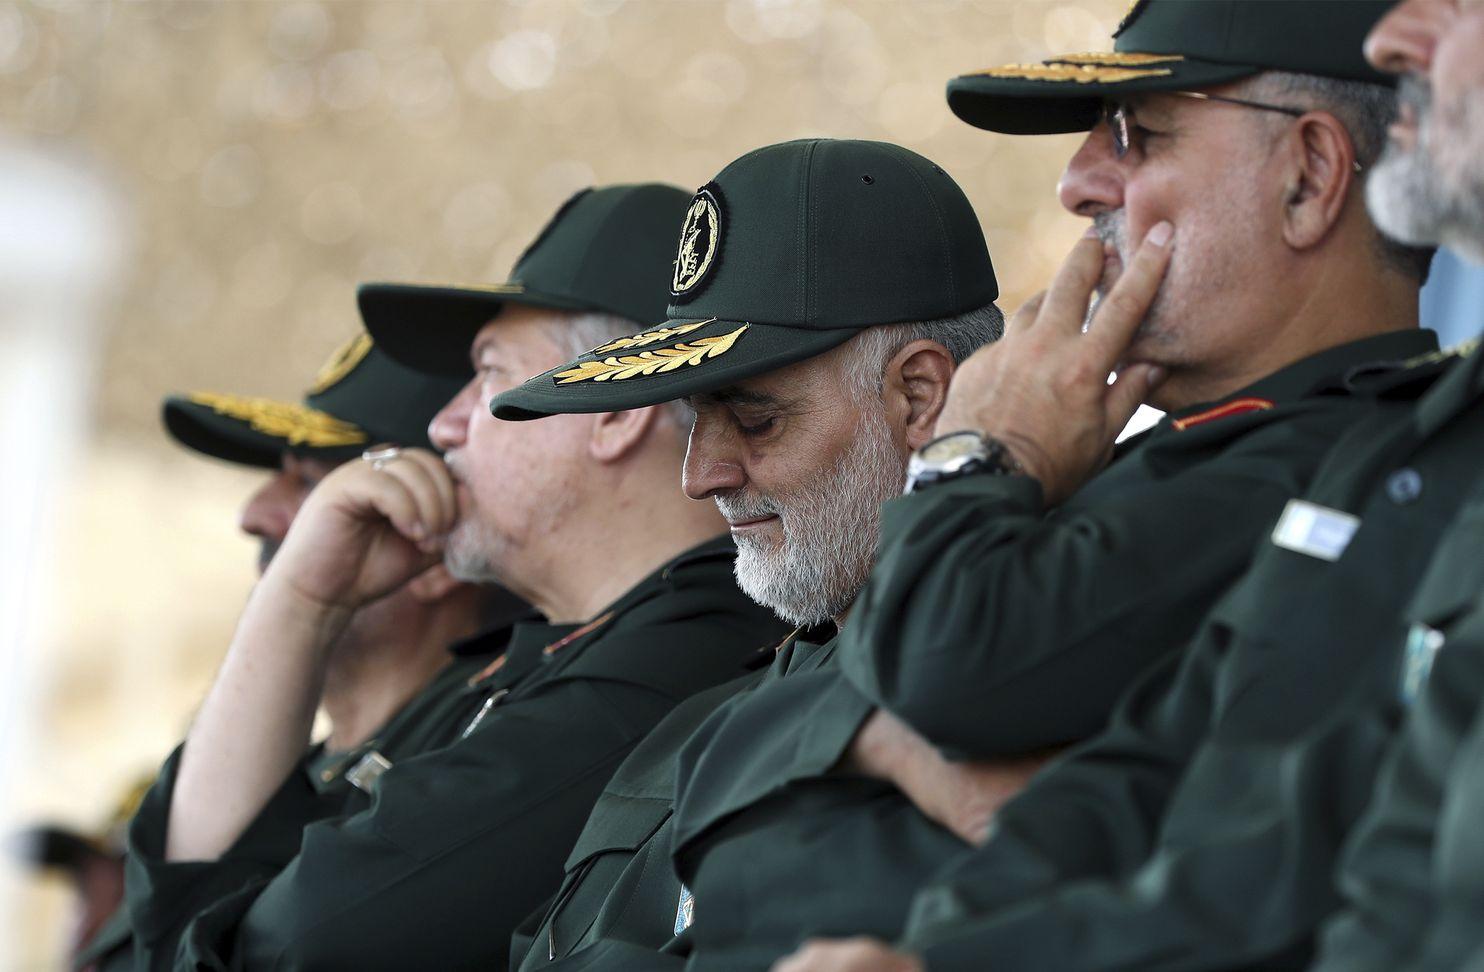 Major-General Soleimani